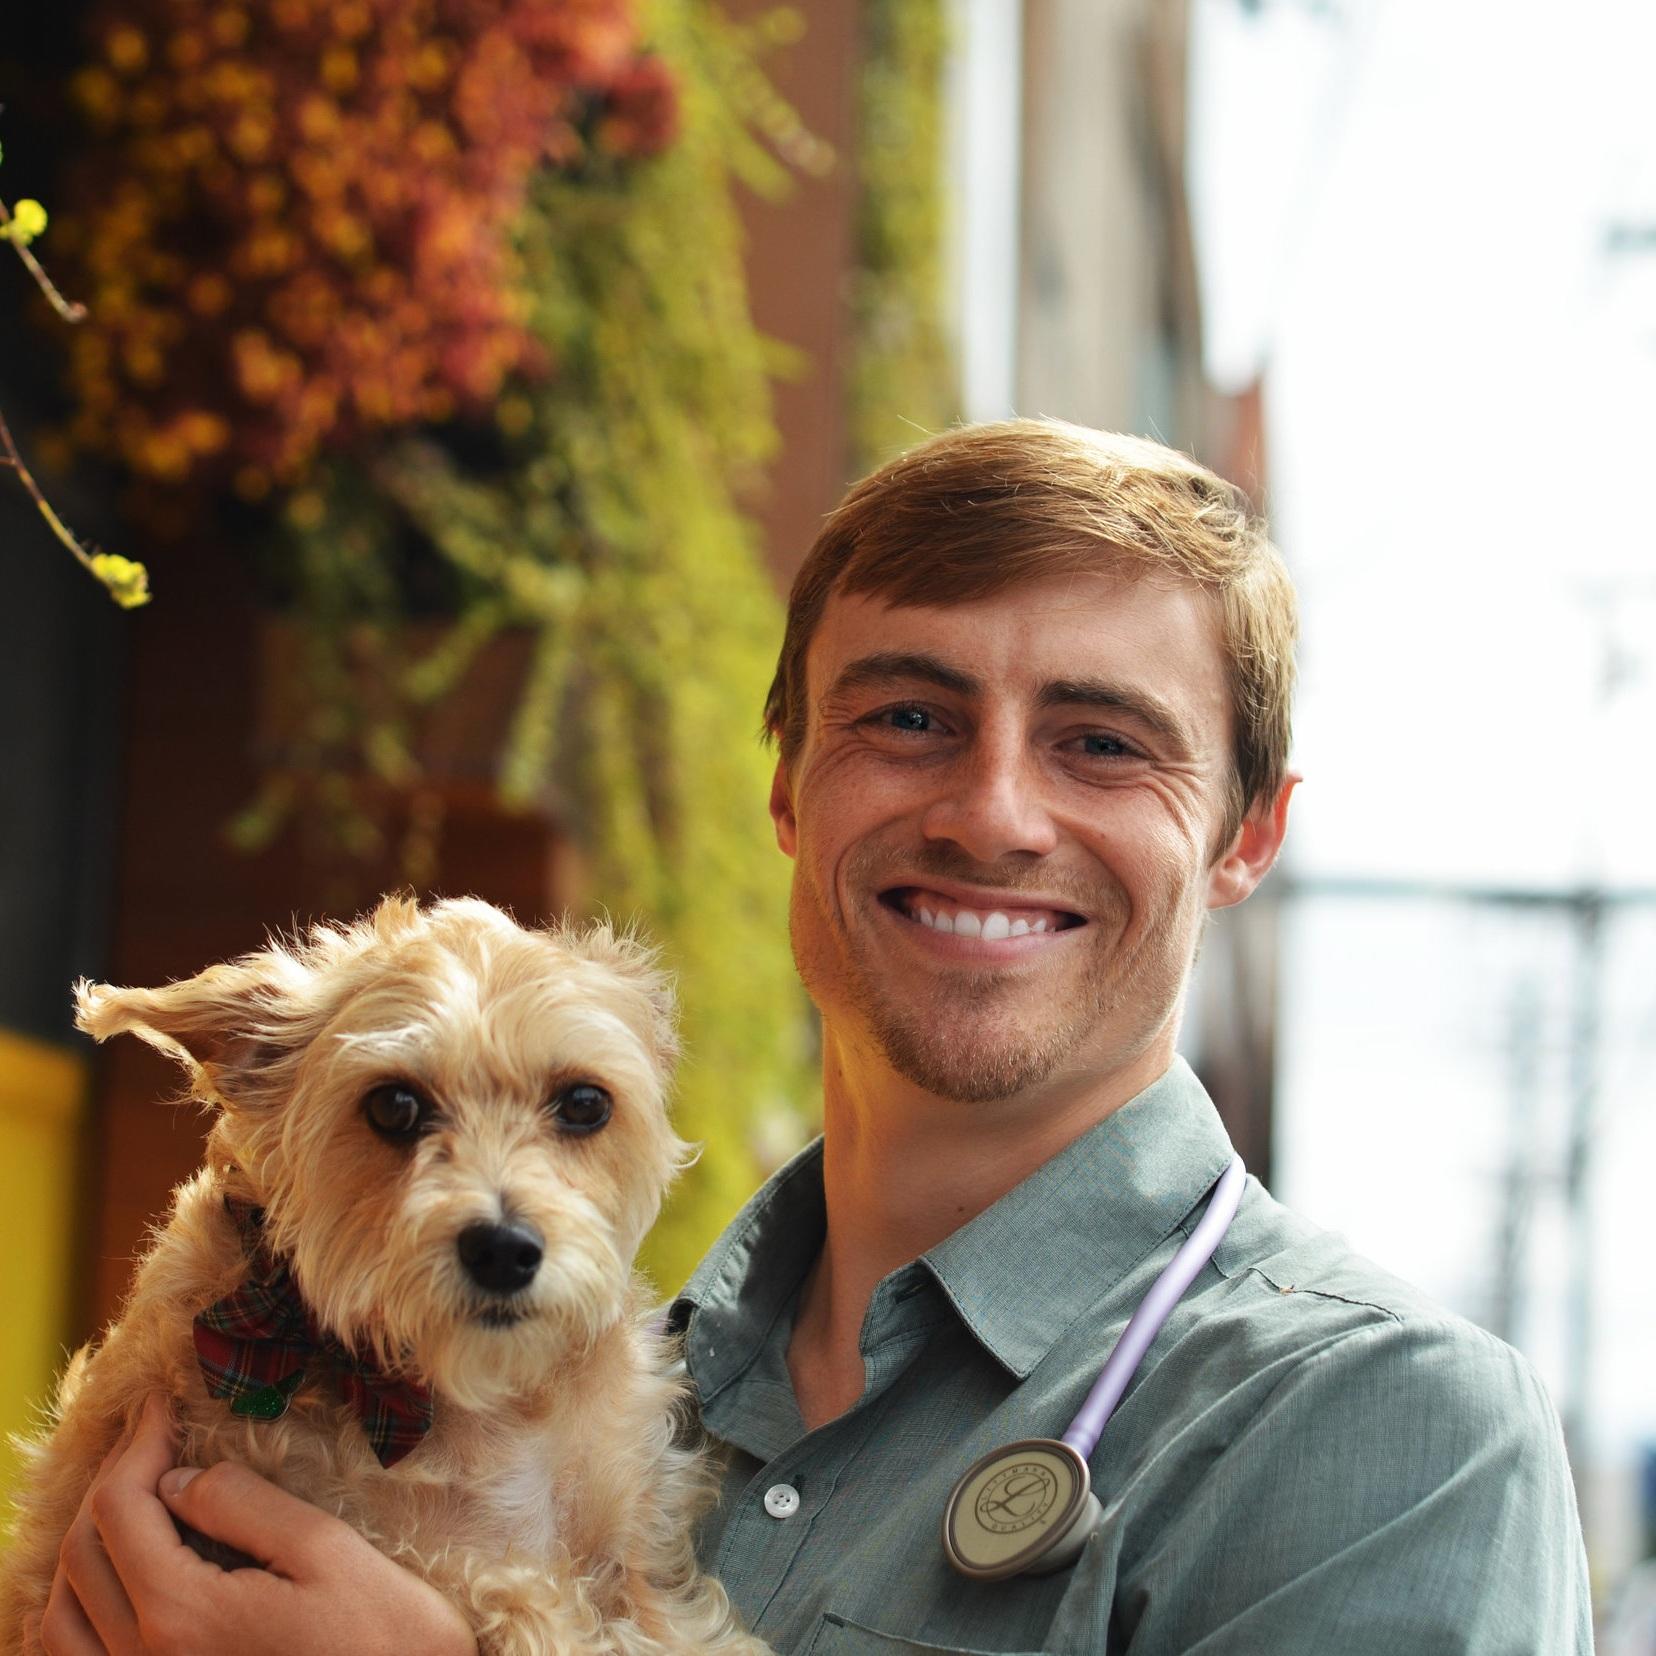 Robert Trimble, DVM - Director, Veterinary Entrepreneurship AcademyCo-founder, Fuzzy Pet Health